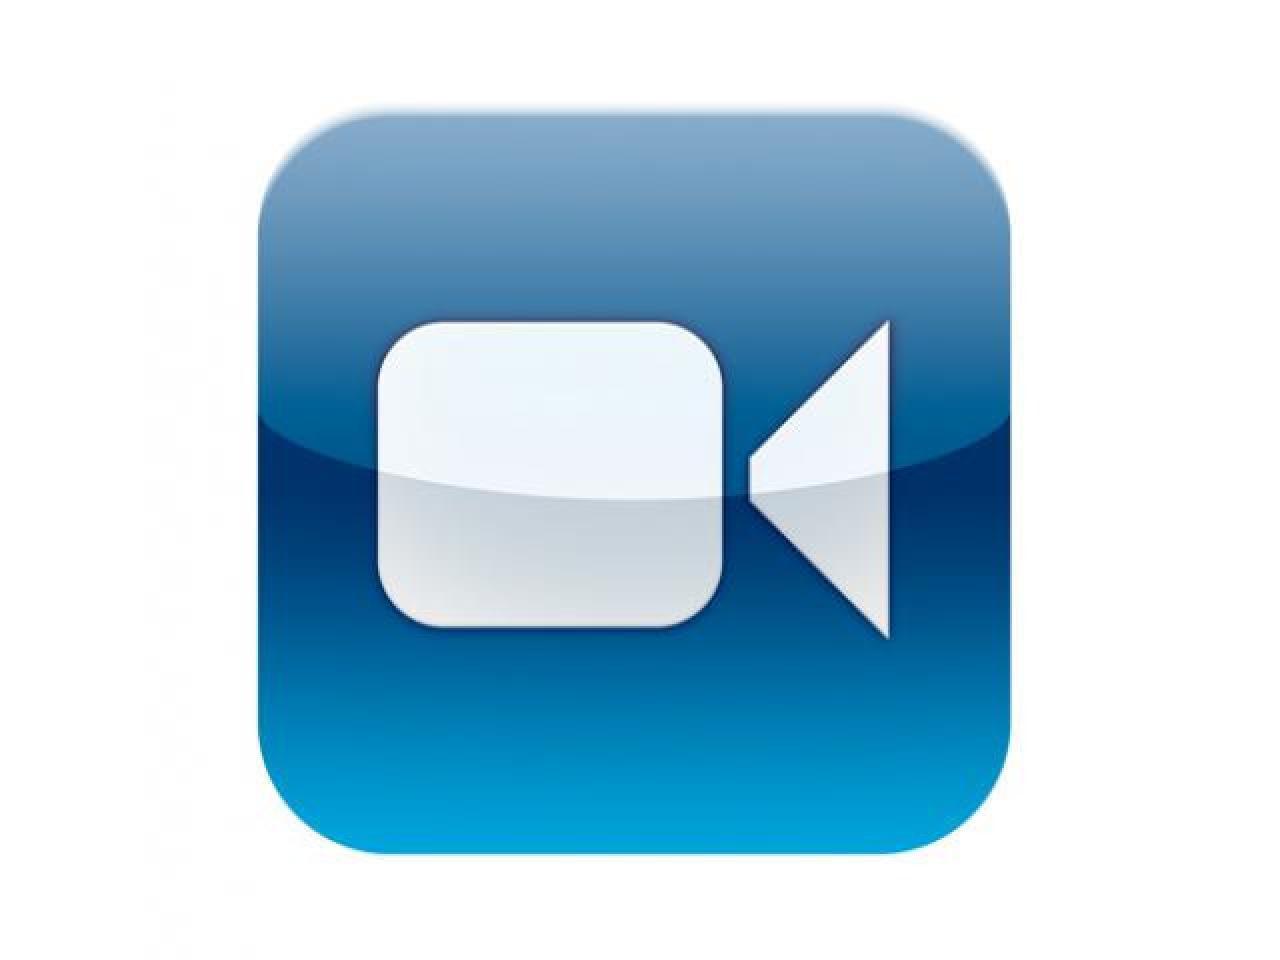 Услуги видео, фото и музыки - 3